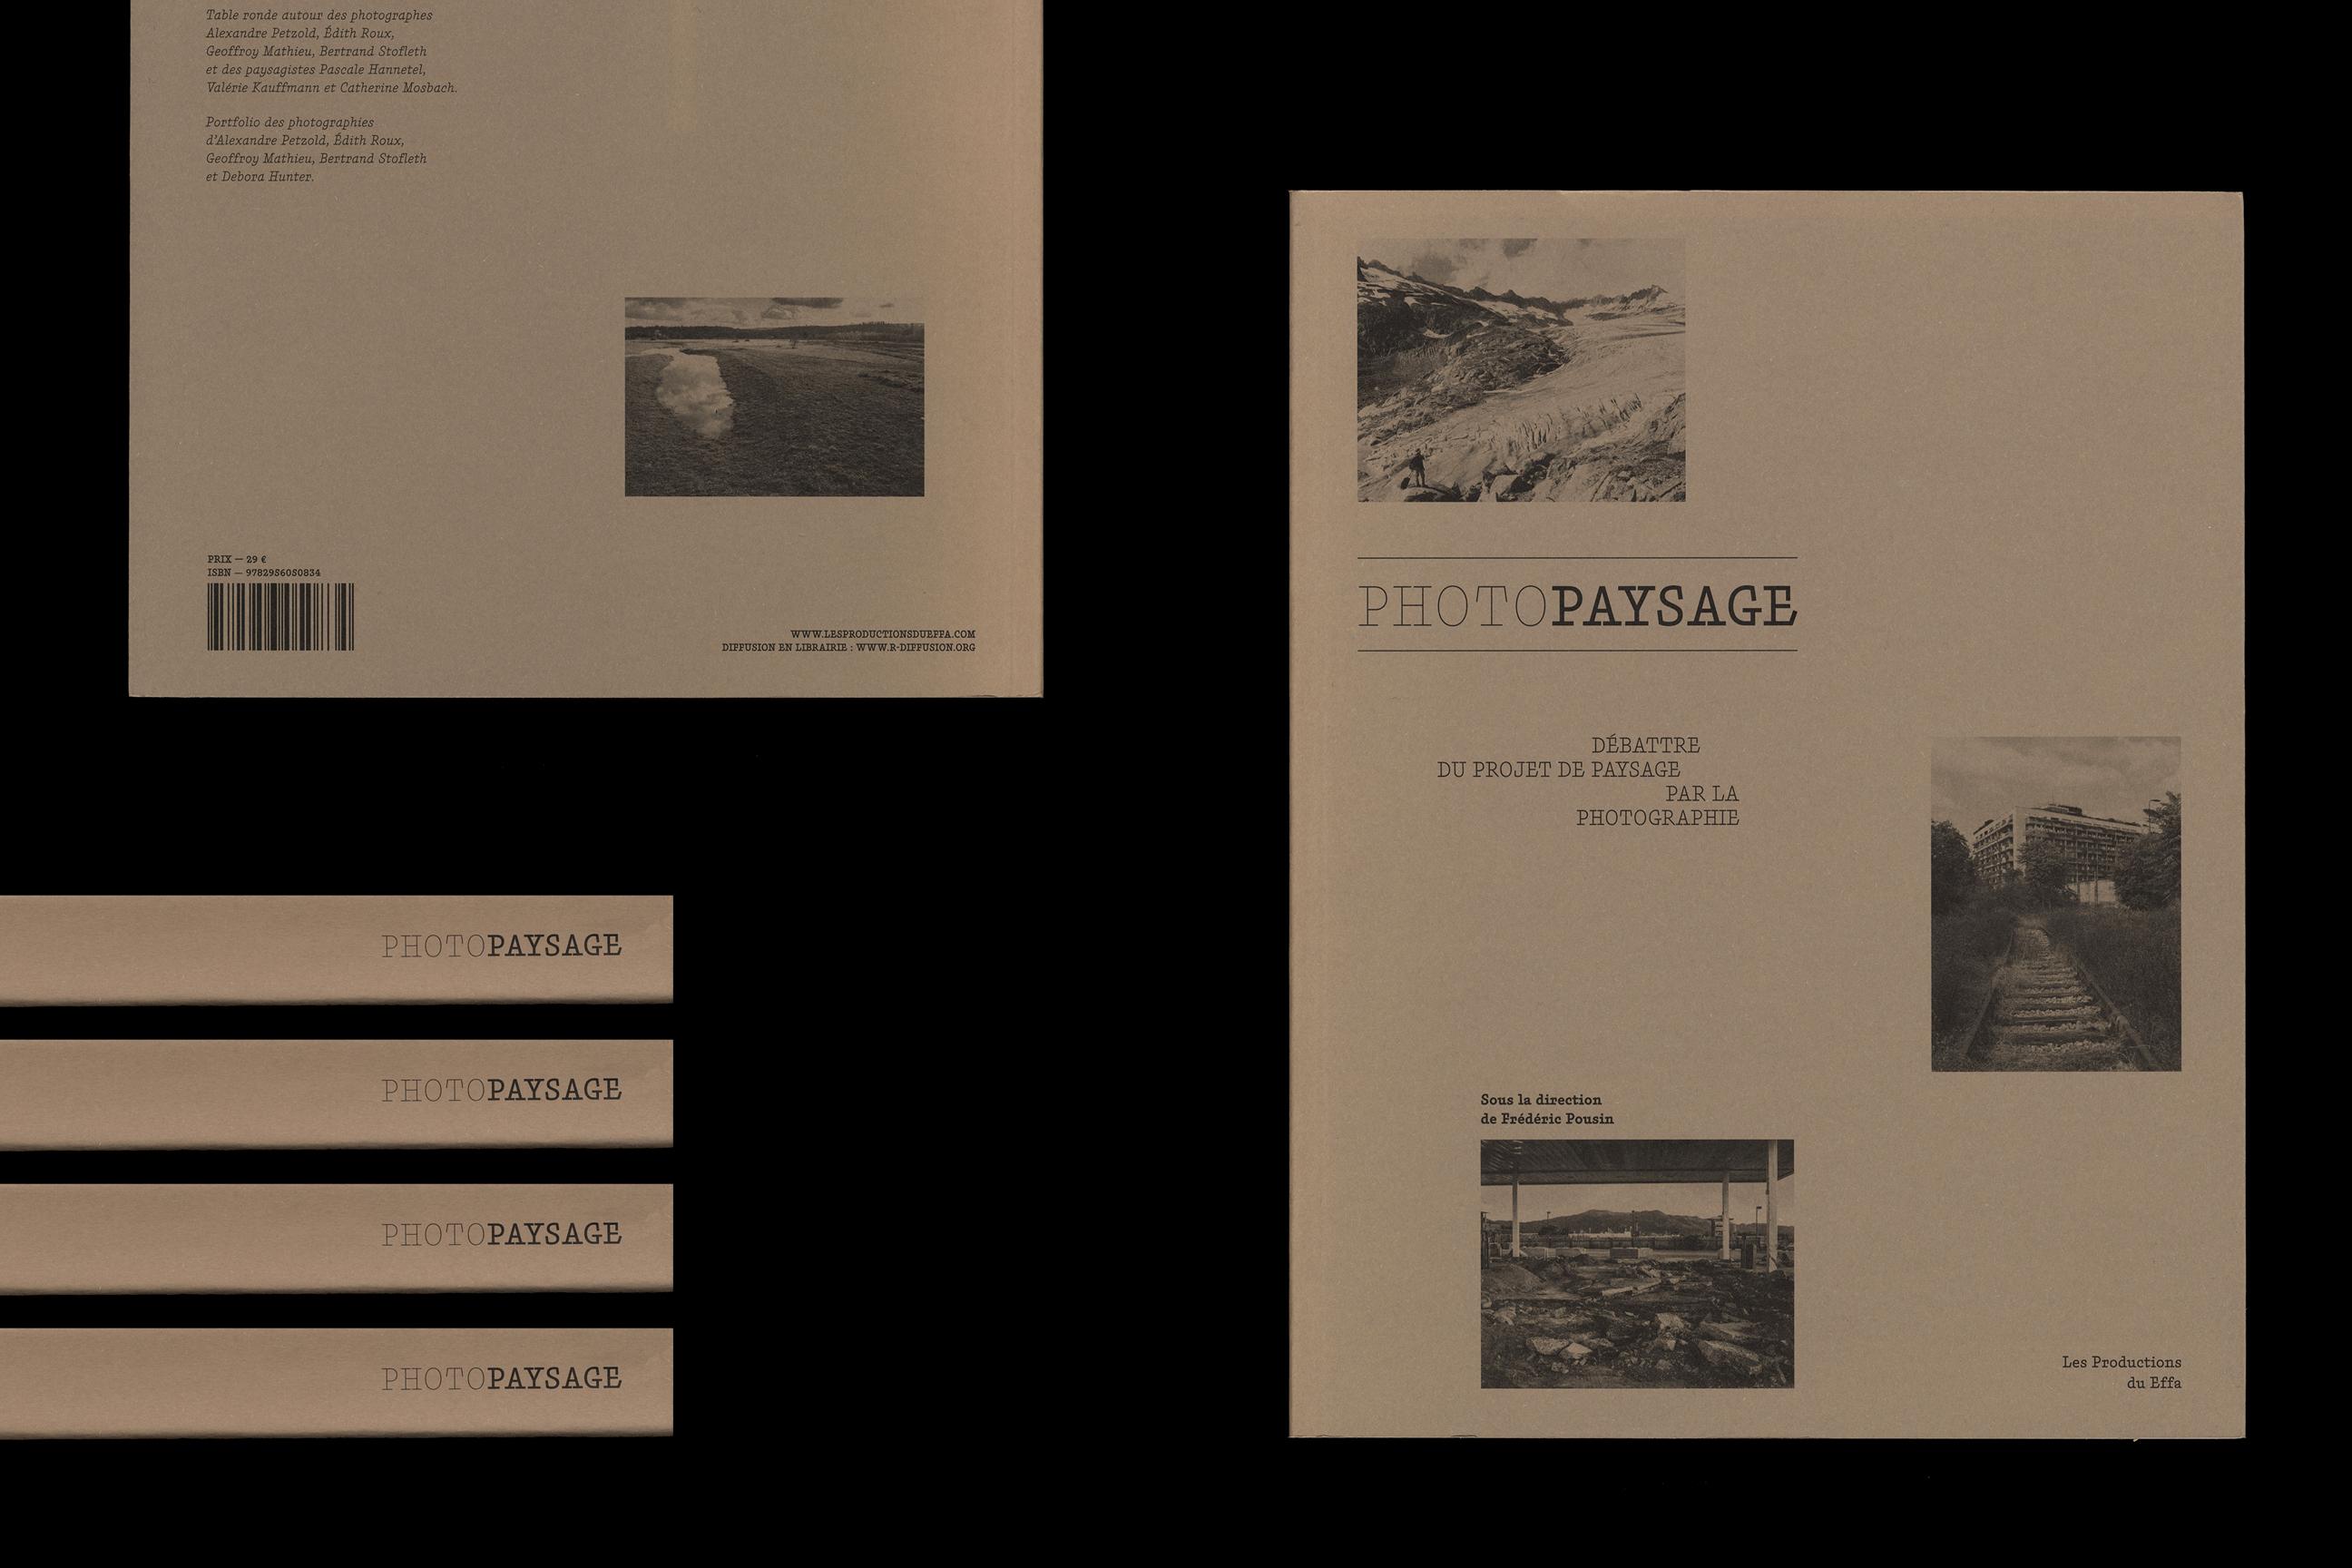 Photopaysage